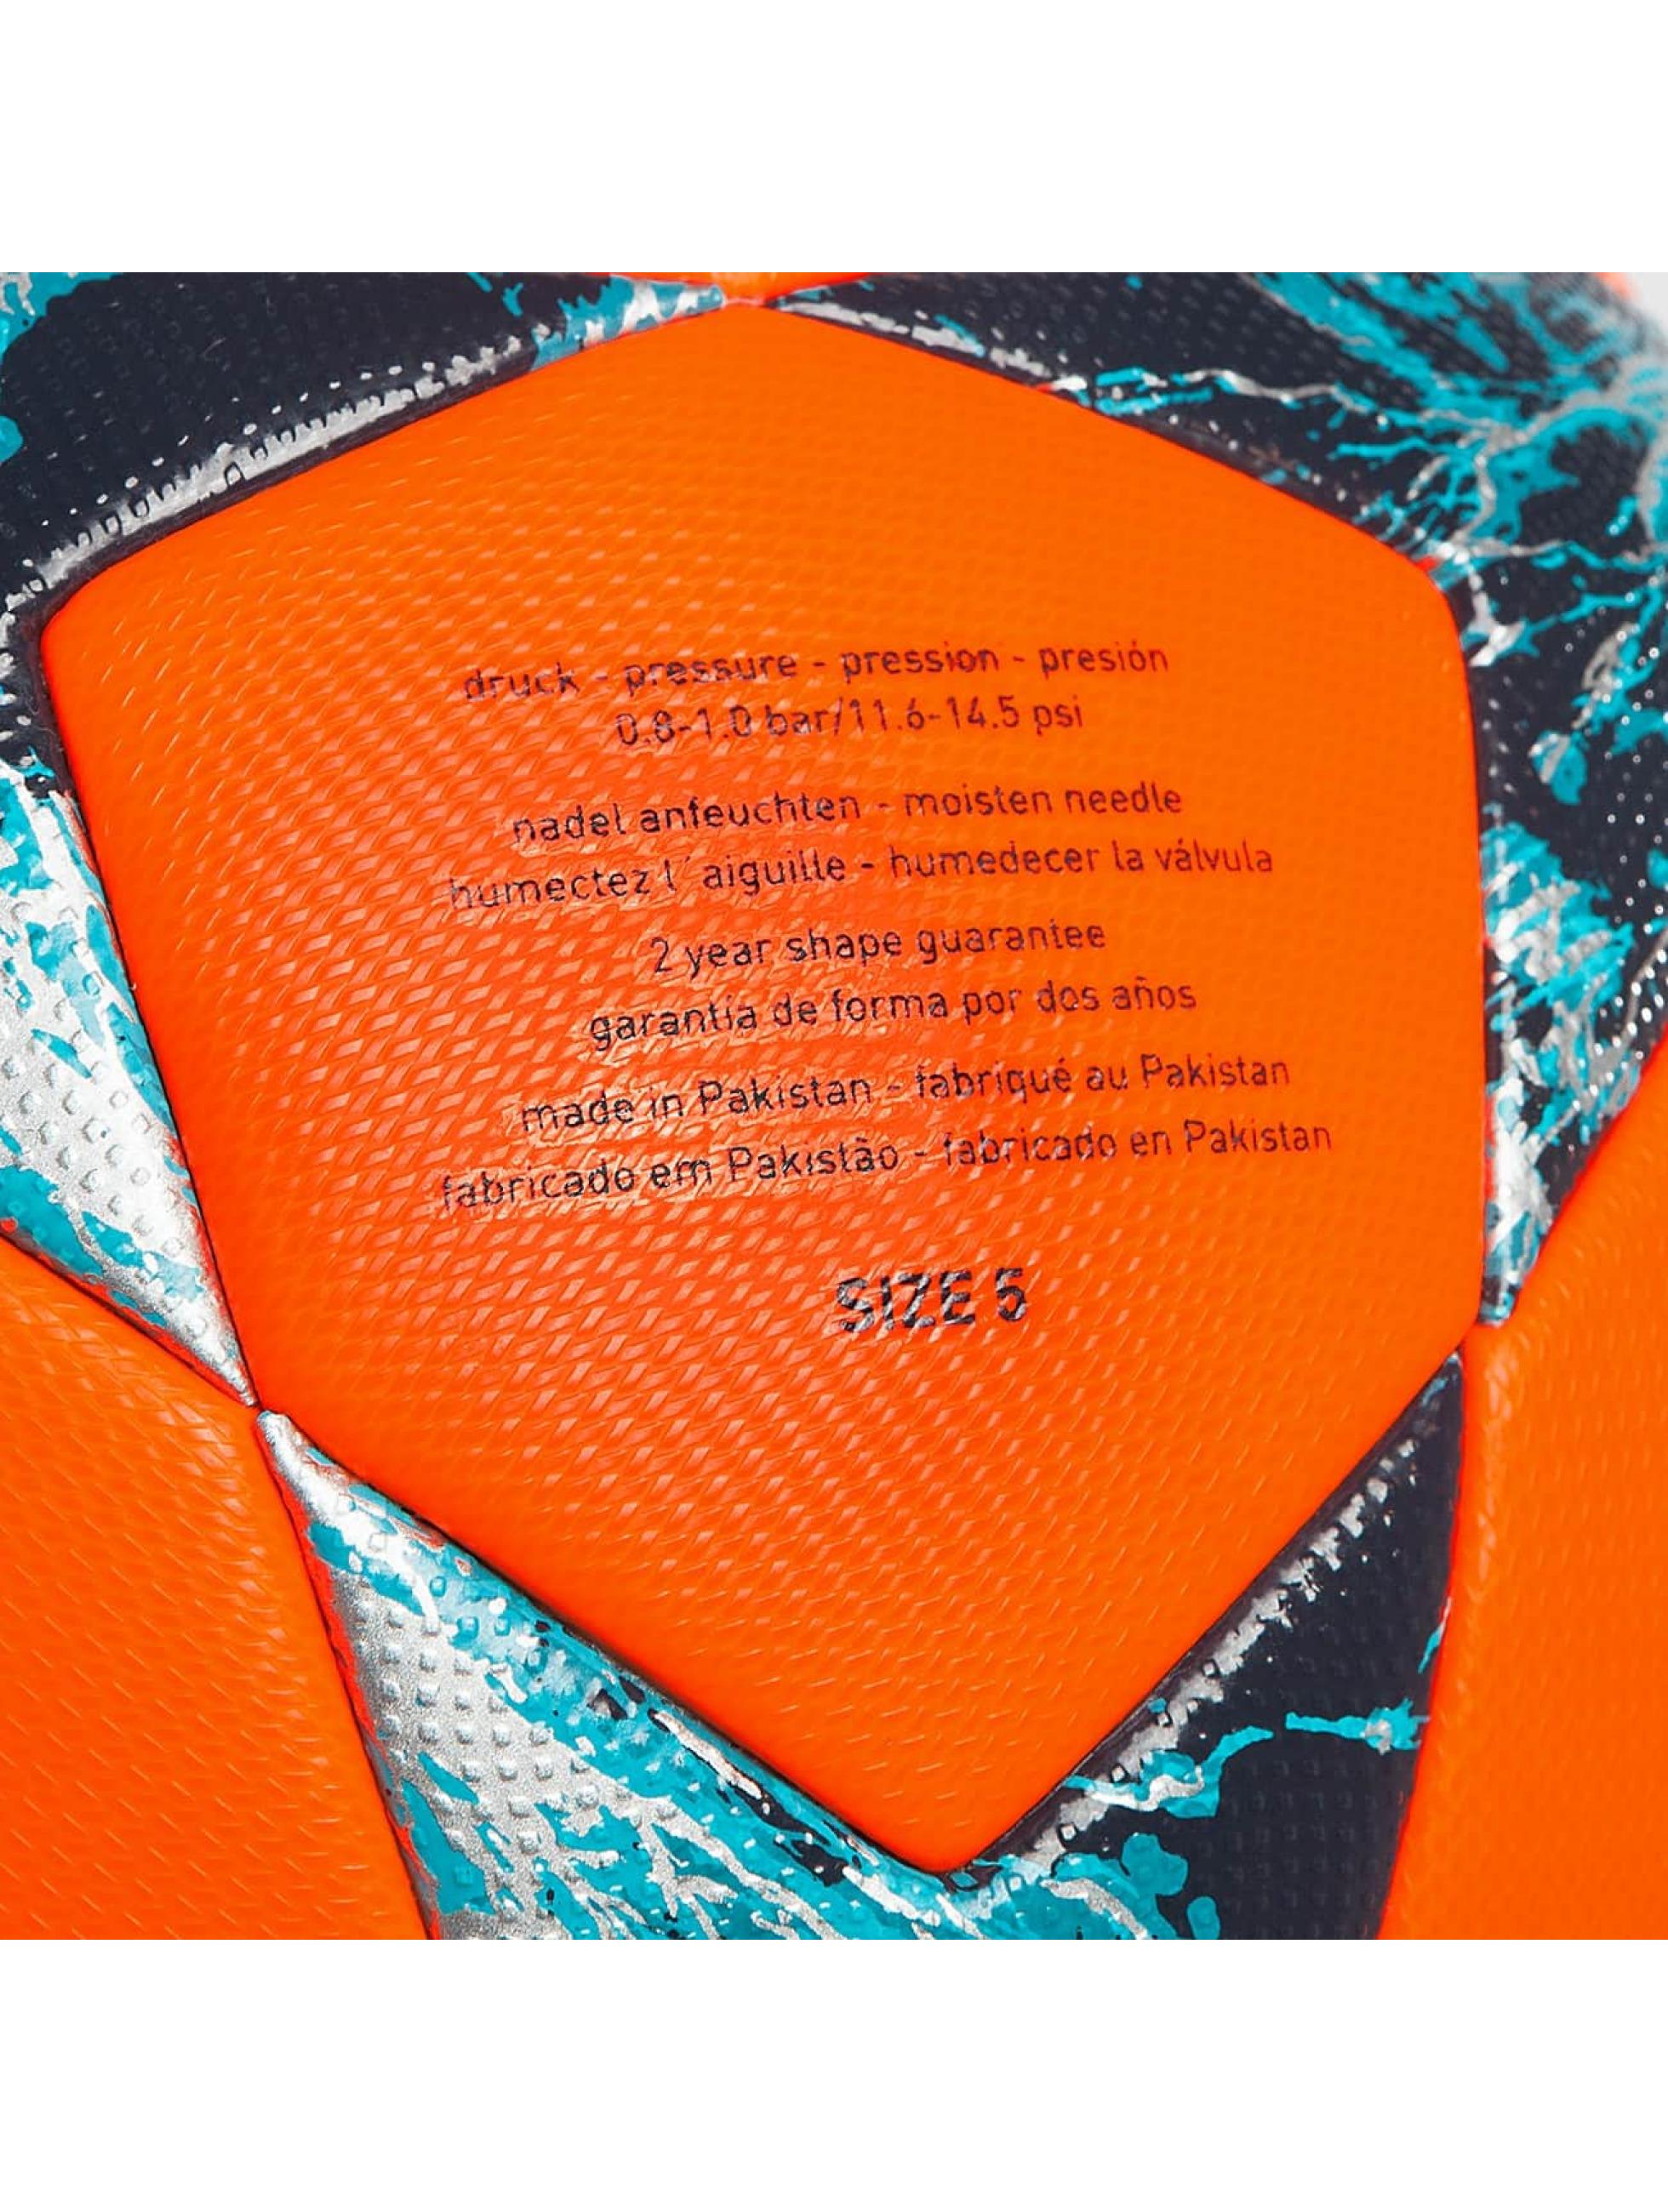 adidas originals Balls Final 17 Offical Match oranžový